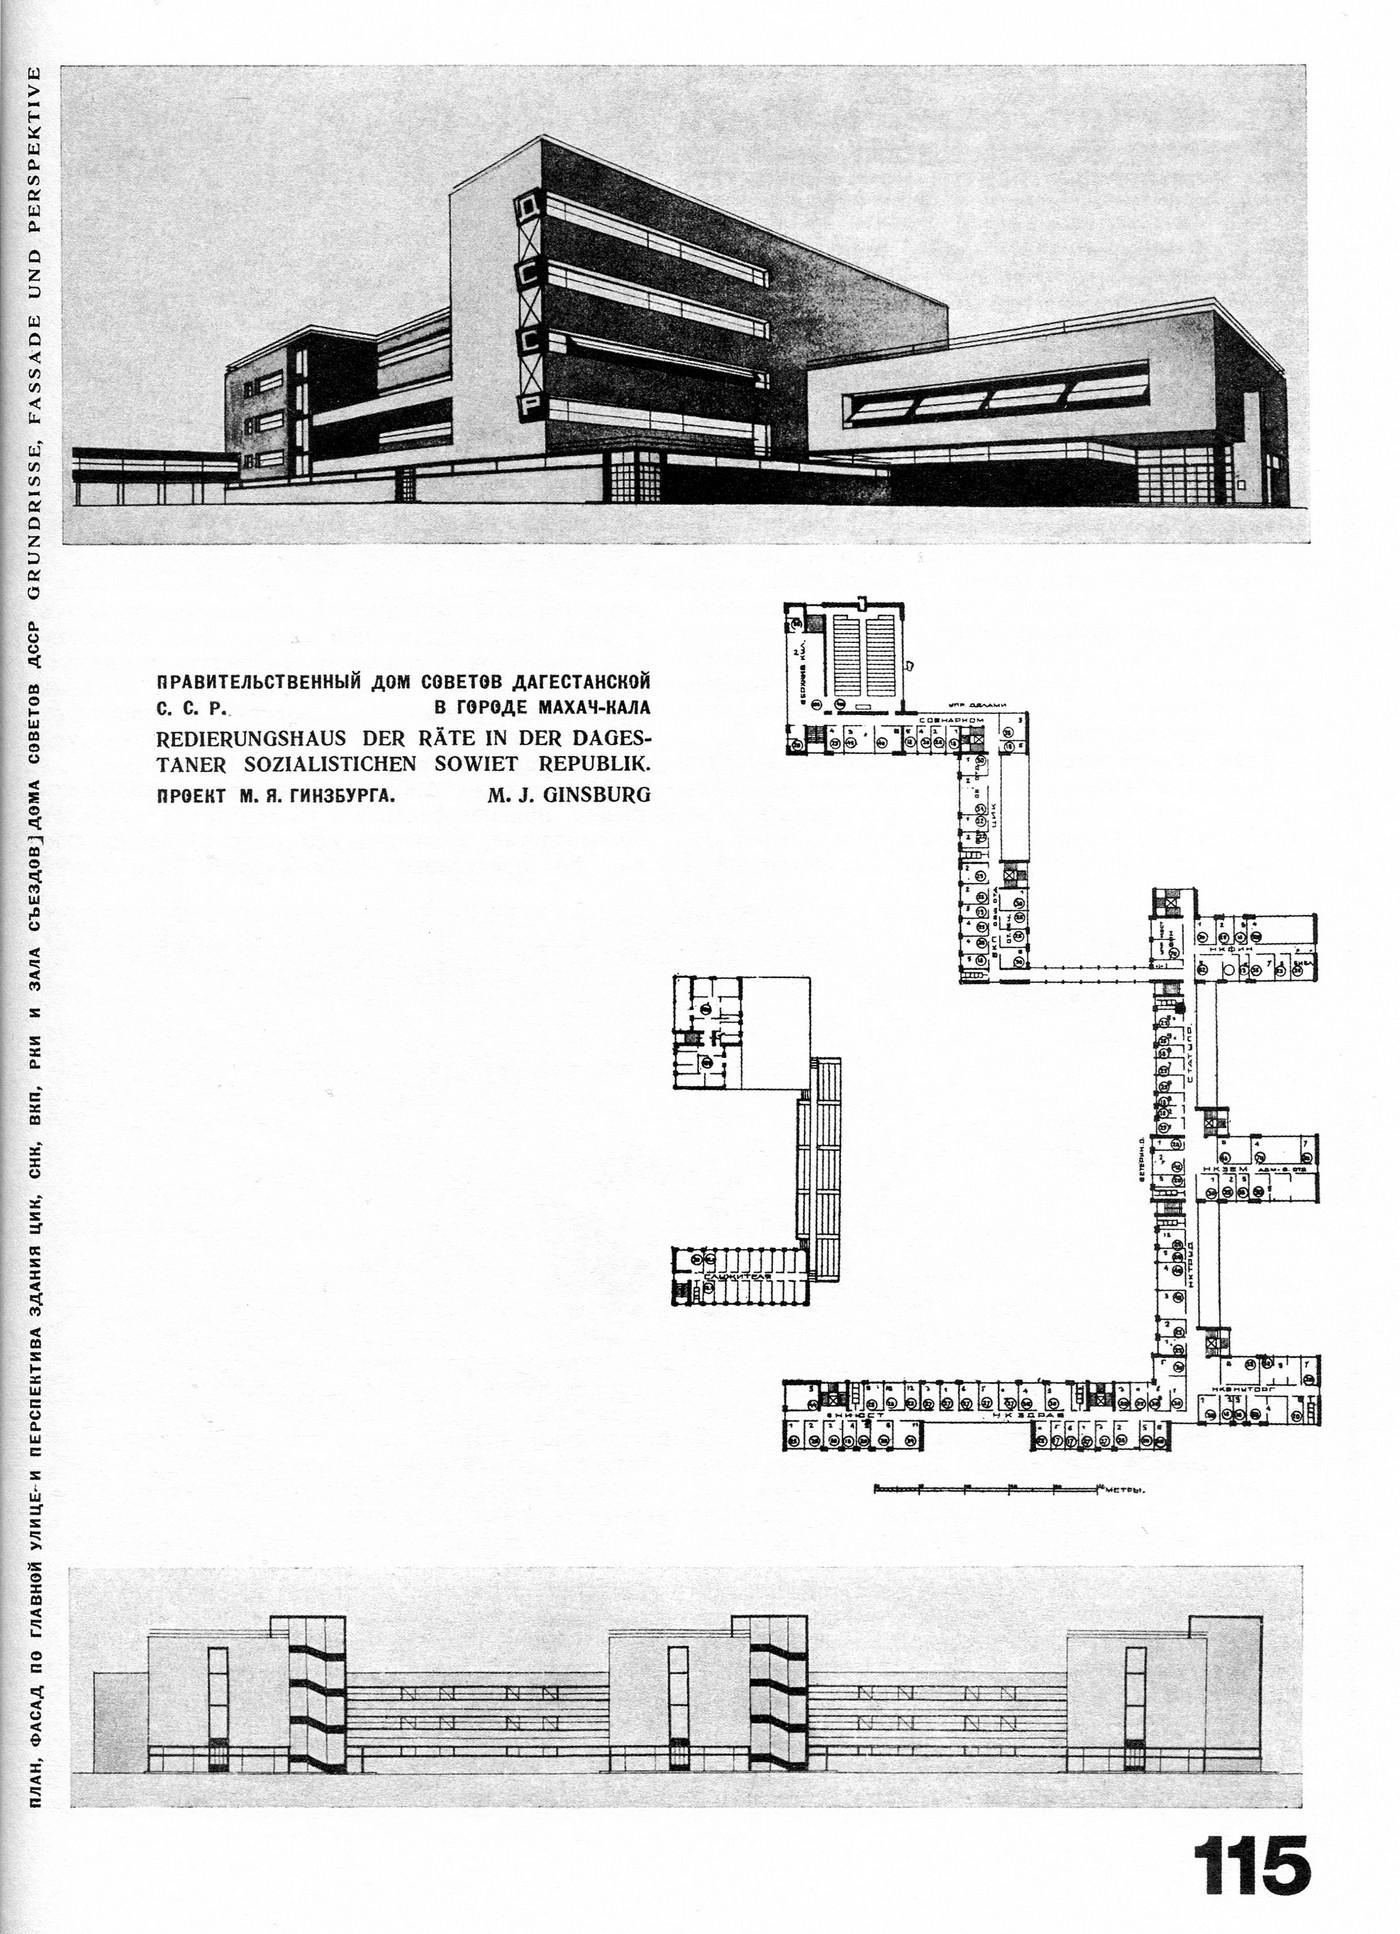 tehne.com-sa-1926-5-6-1400-0007